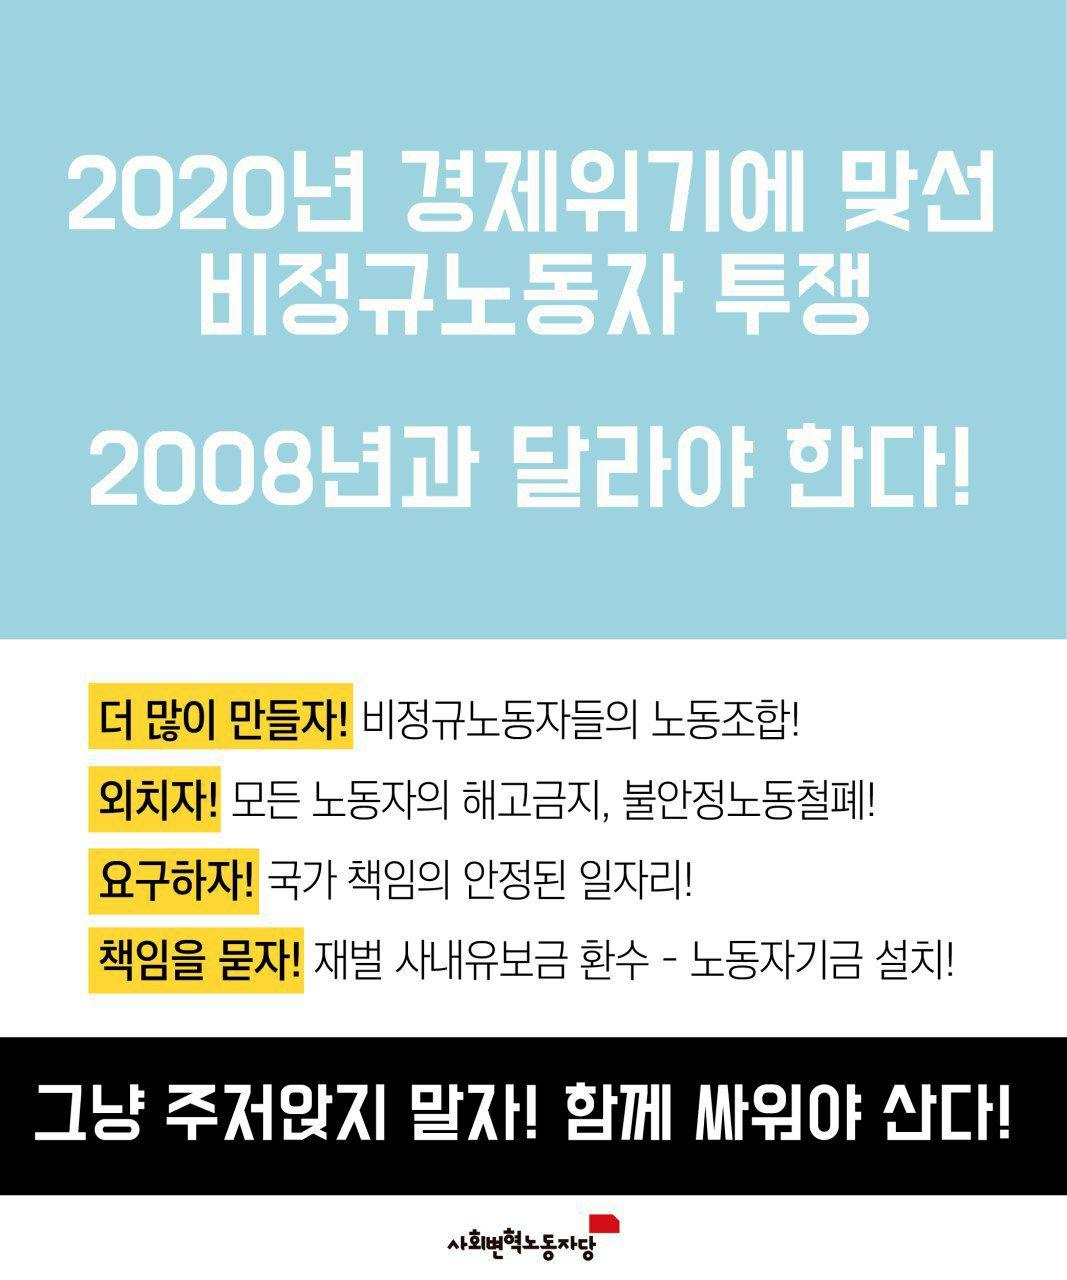 photo_2020-06-03_19-57-26 (3).jpg